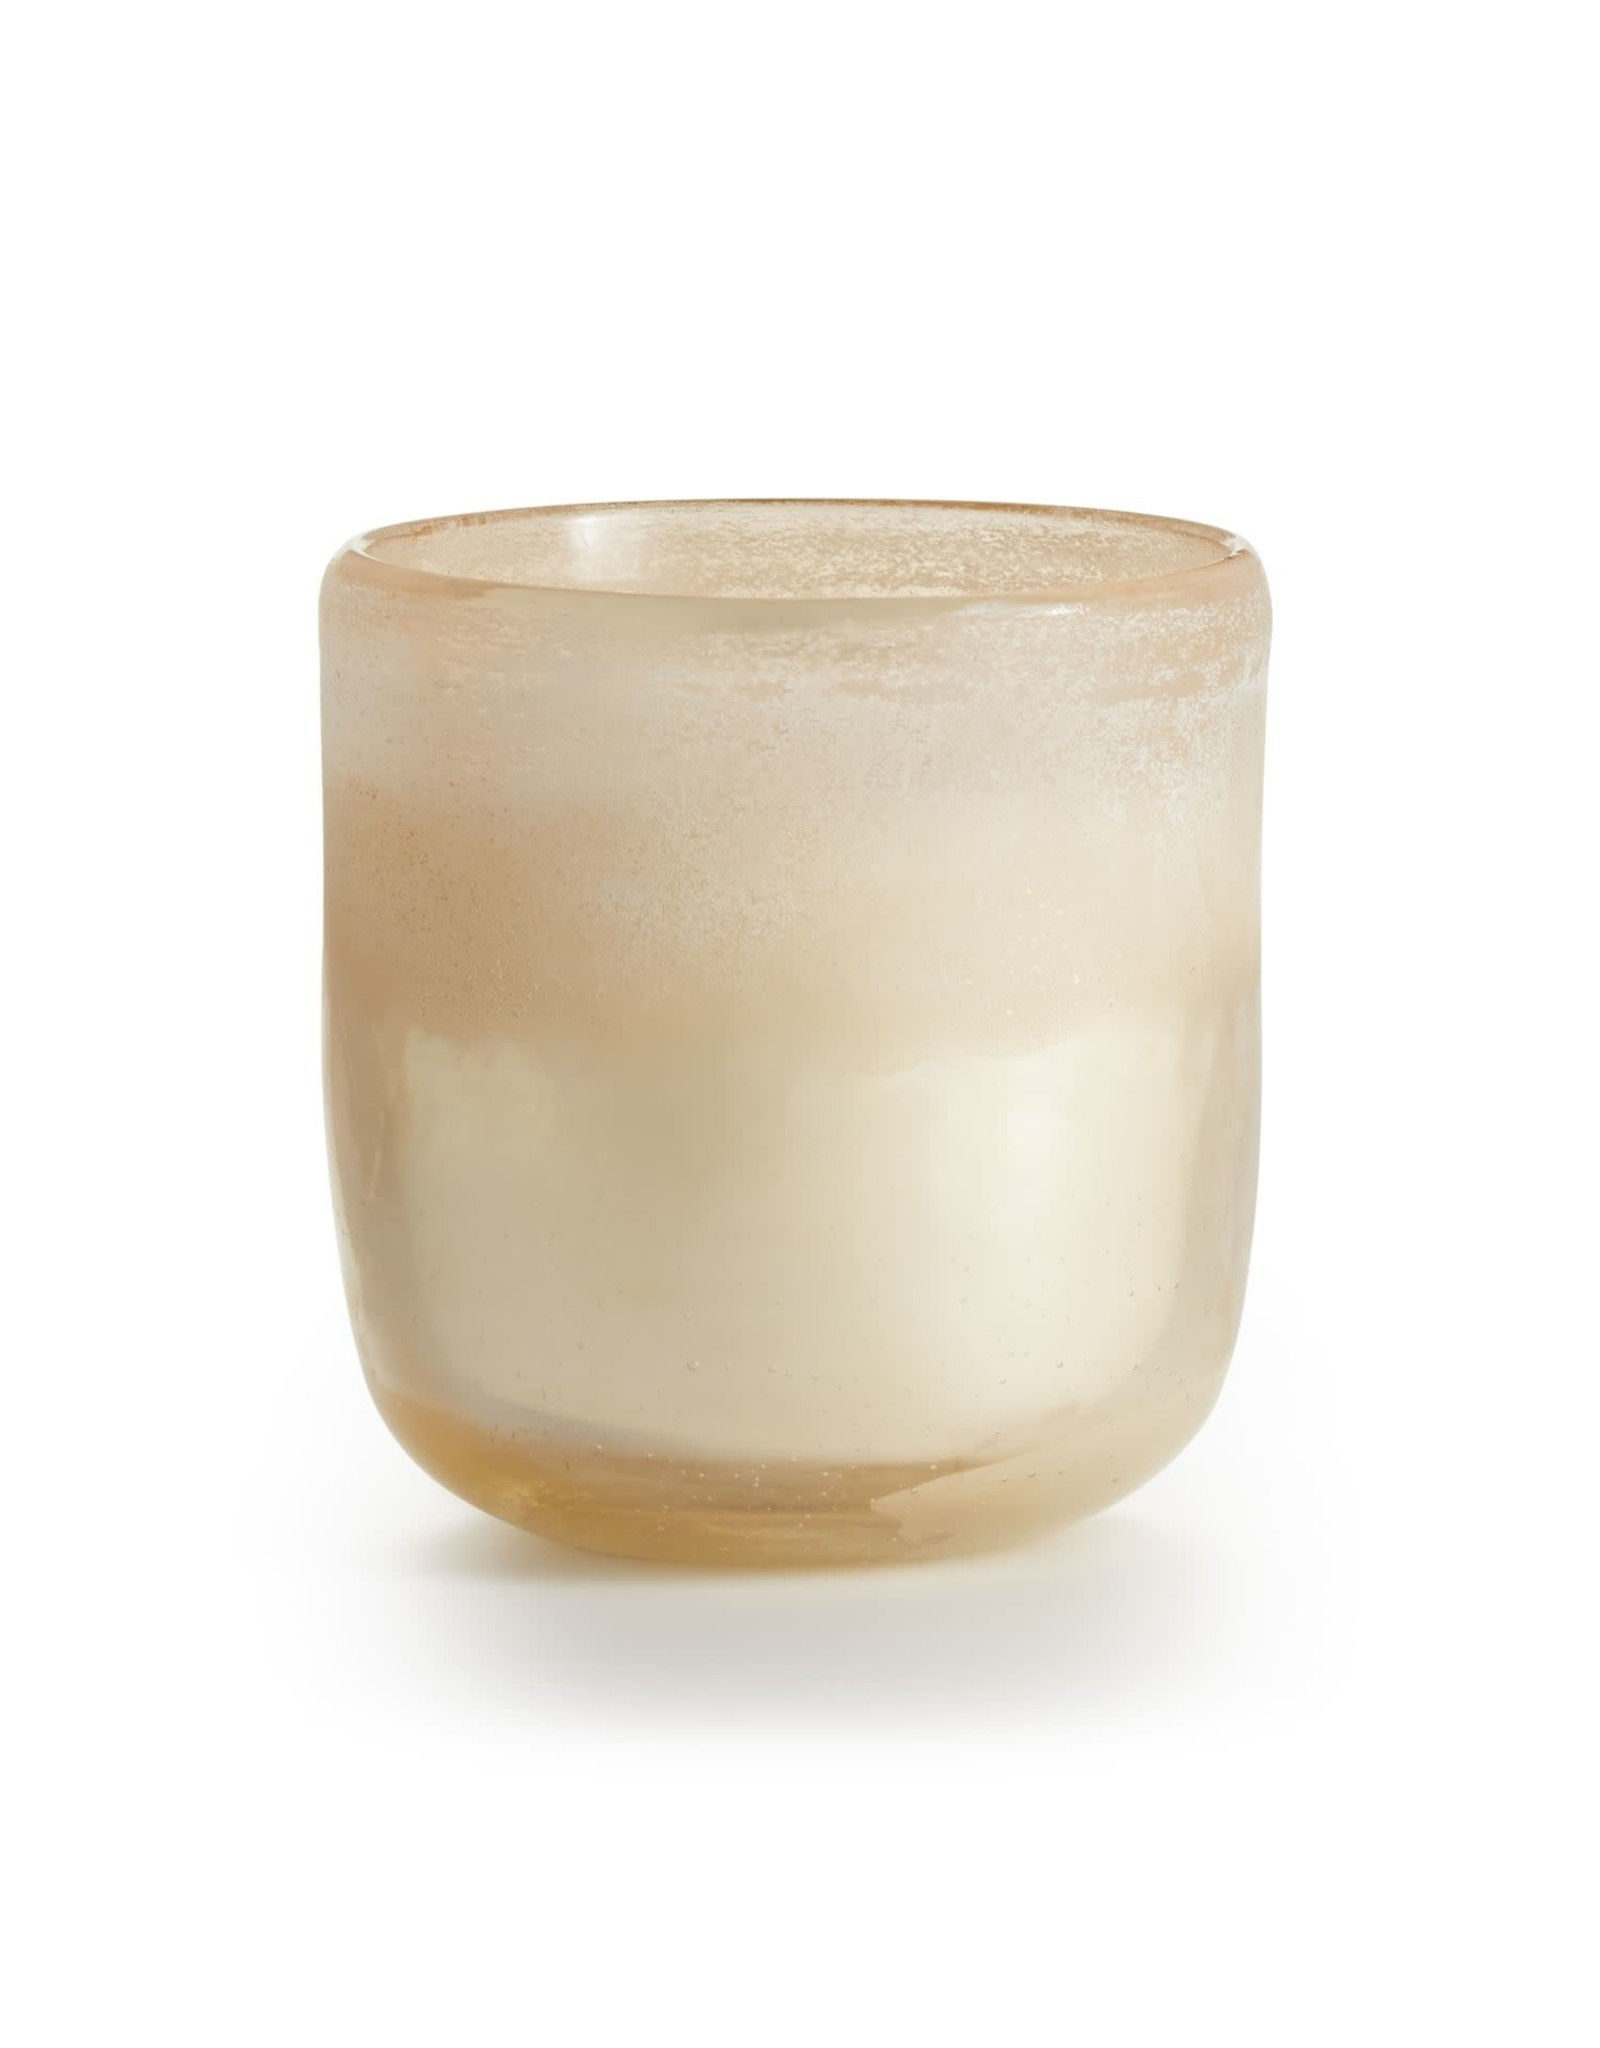 Illume 13 oz Mojave Glass Candle - Coconut Milk Mango